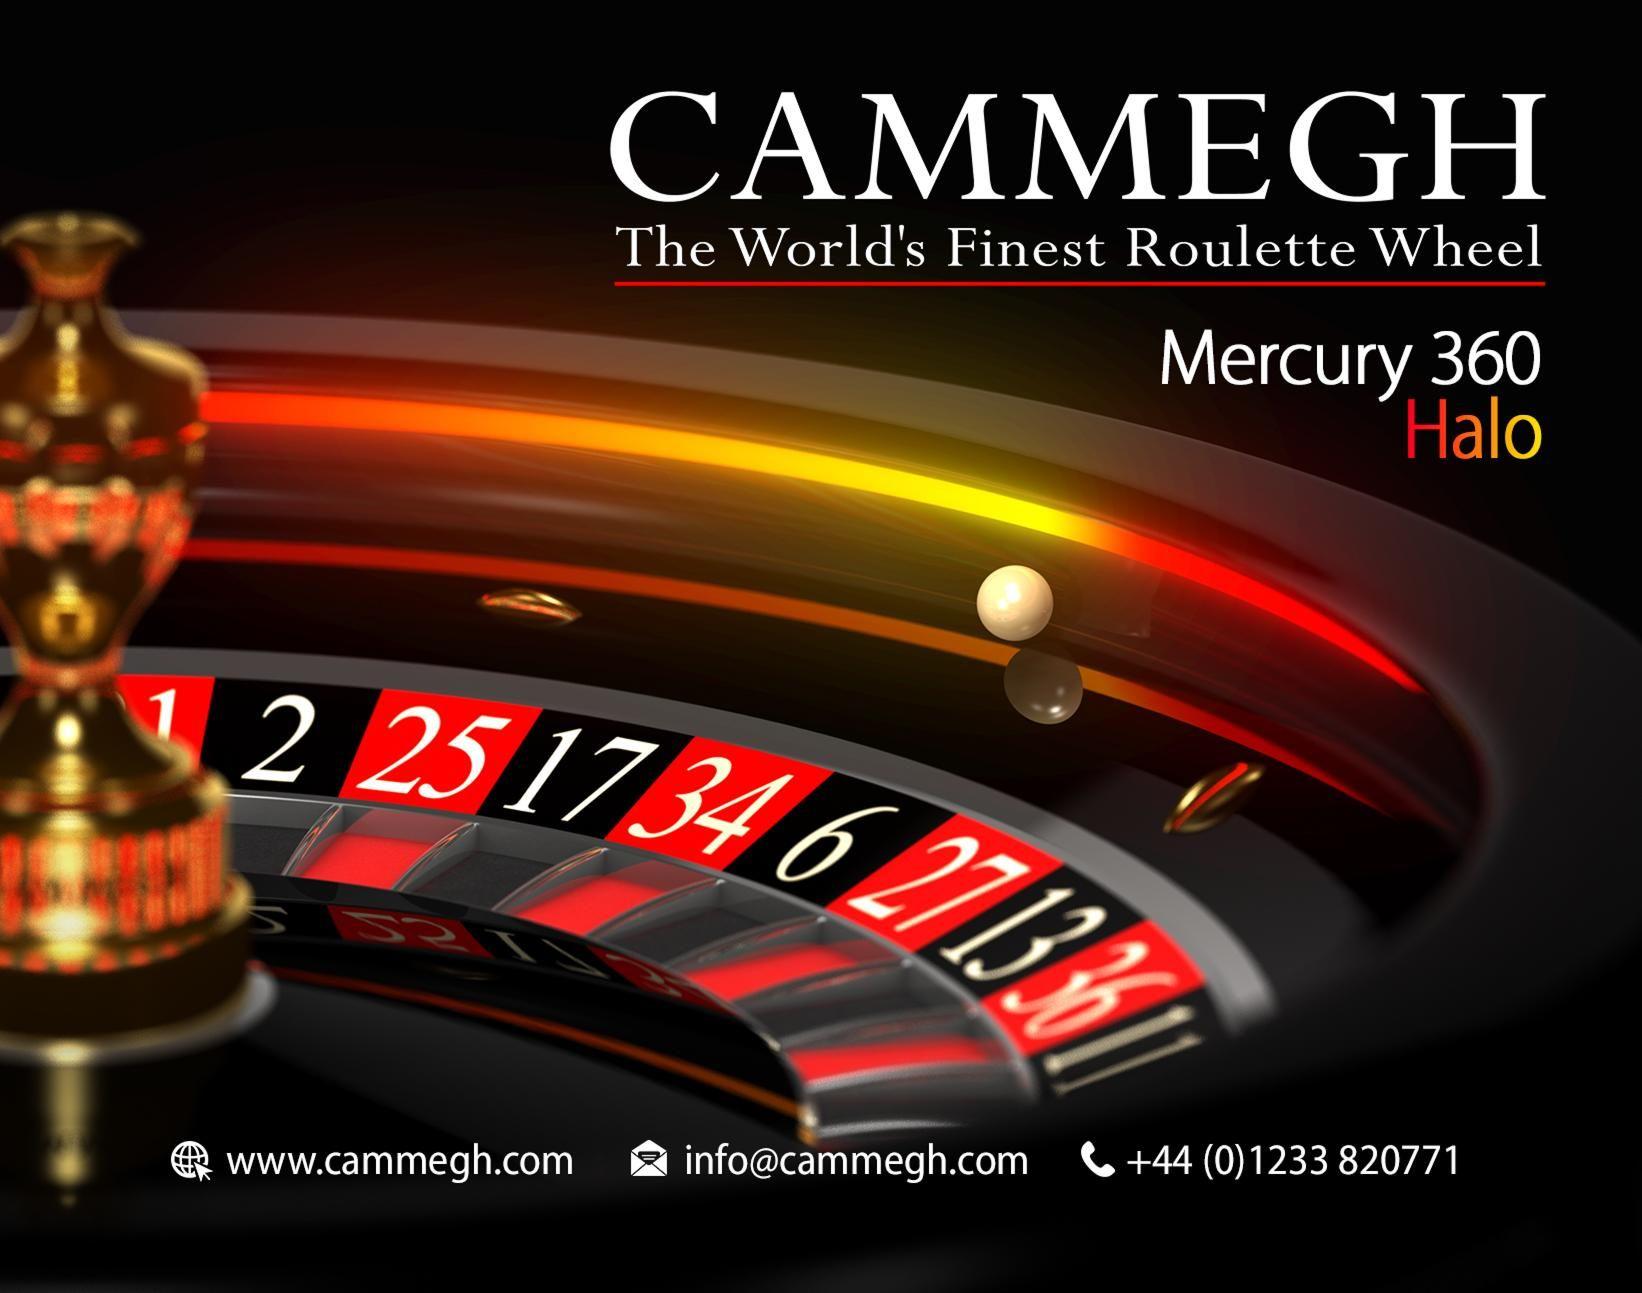 Cammegh Ltd